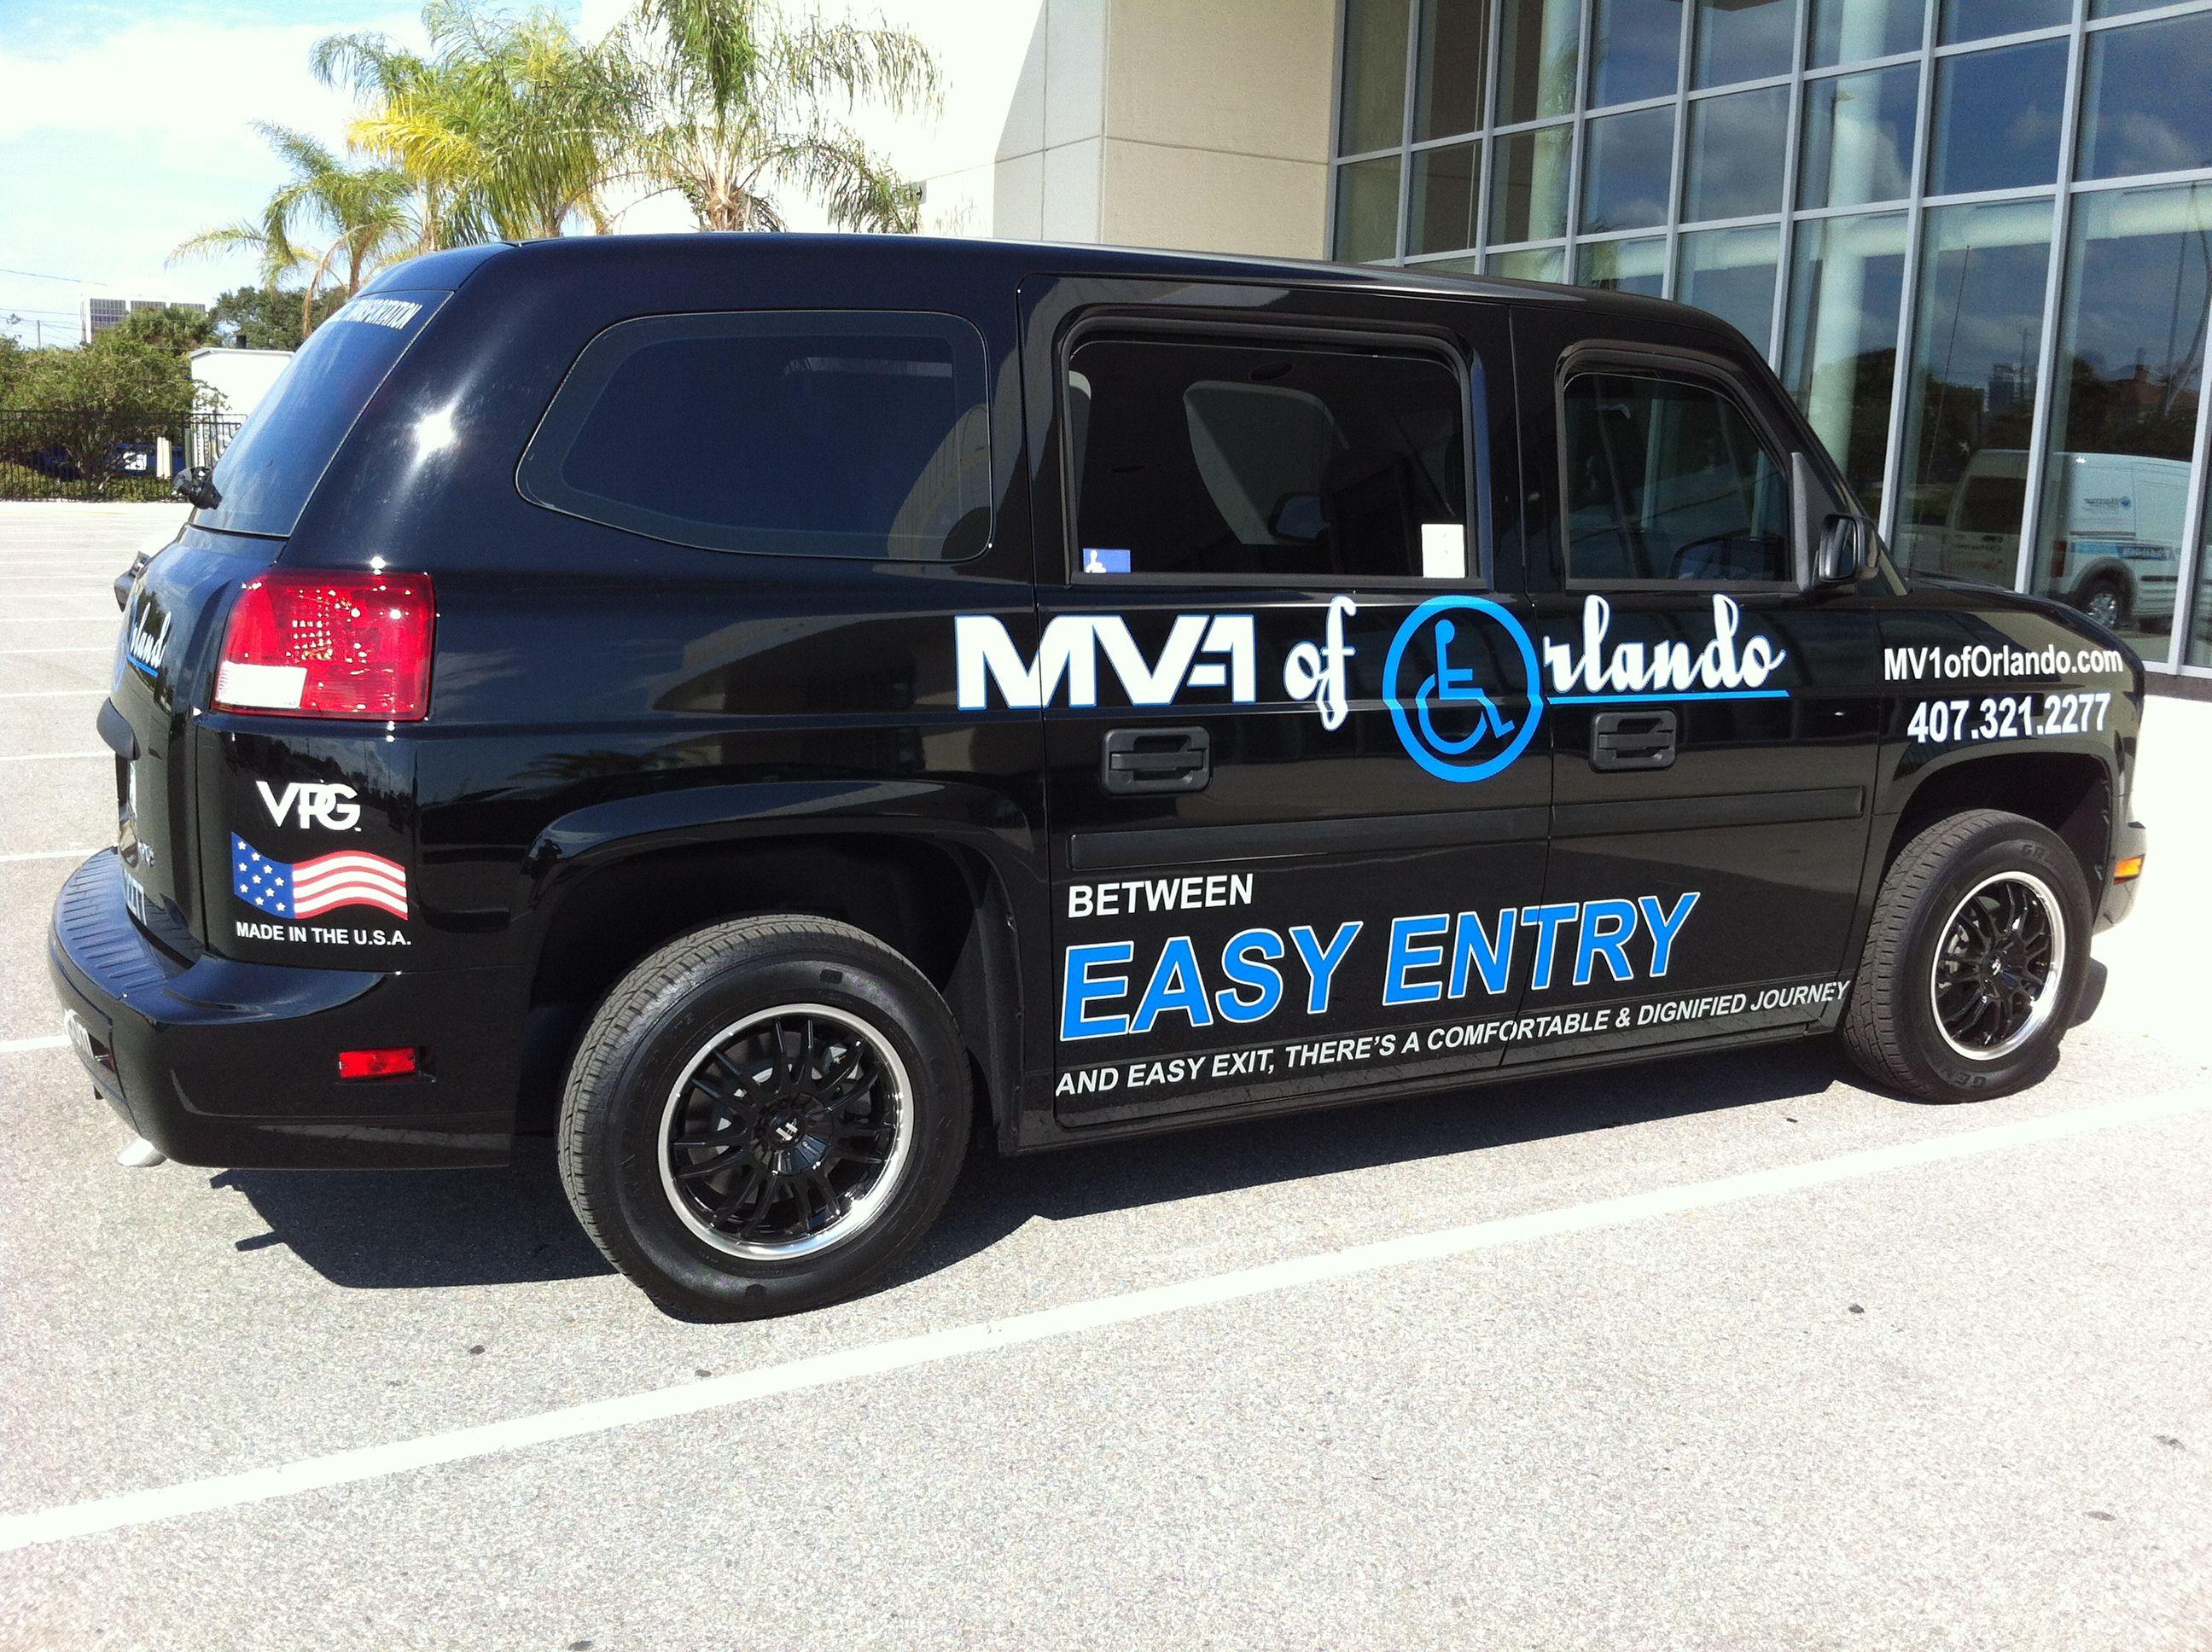 Mv 1 For Sale >> Mv 1 Nmeda Mv 1 Of Orlando Vpgmv1 Mv1 Mobilityvehicle